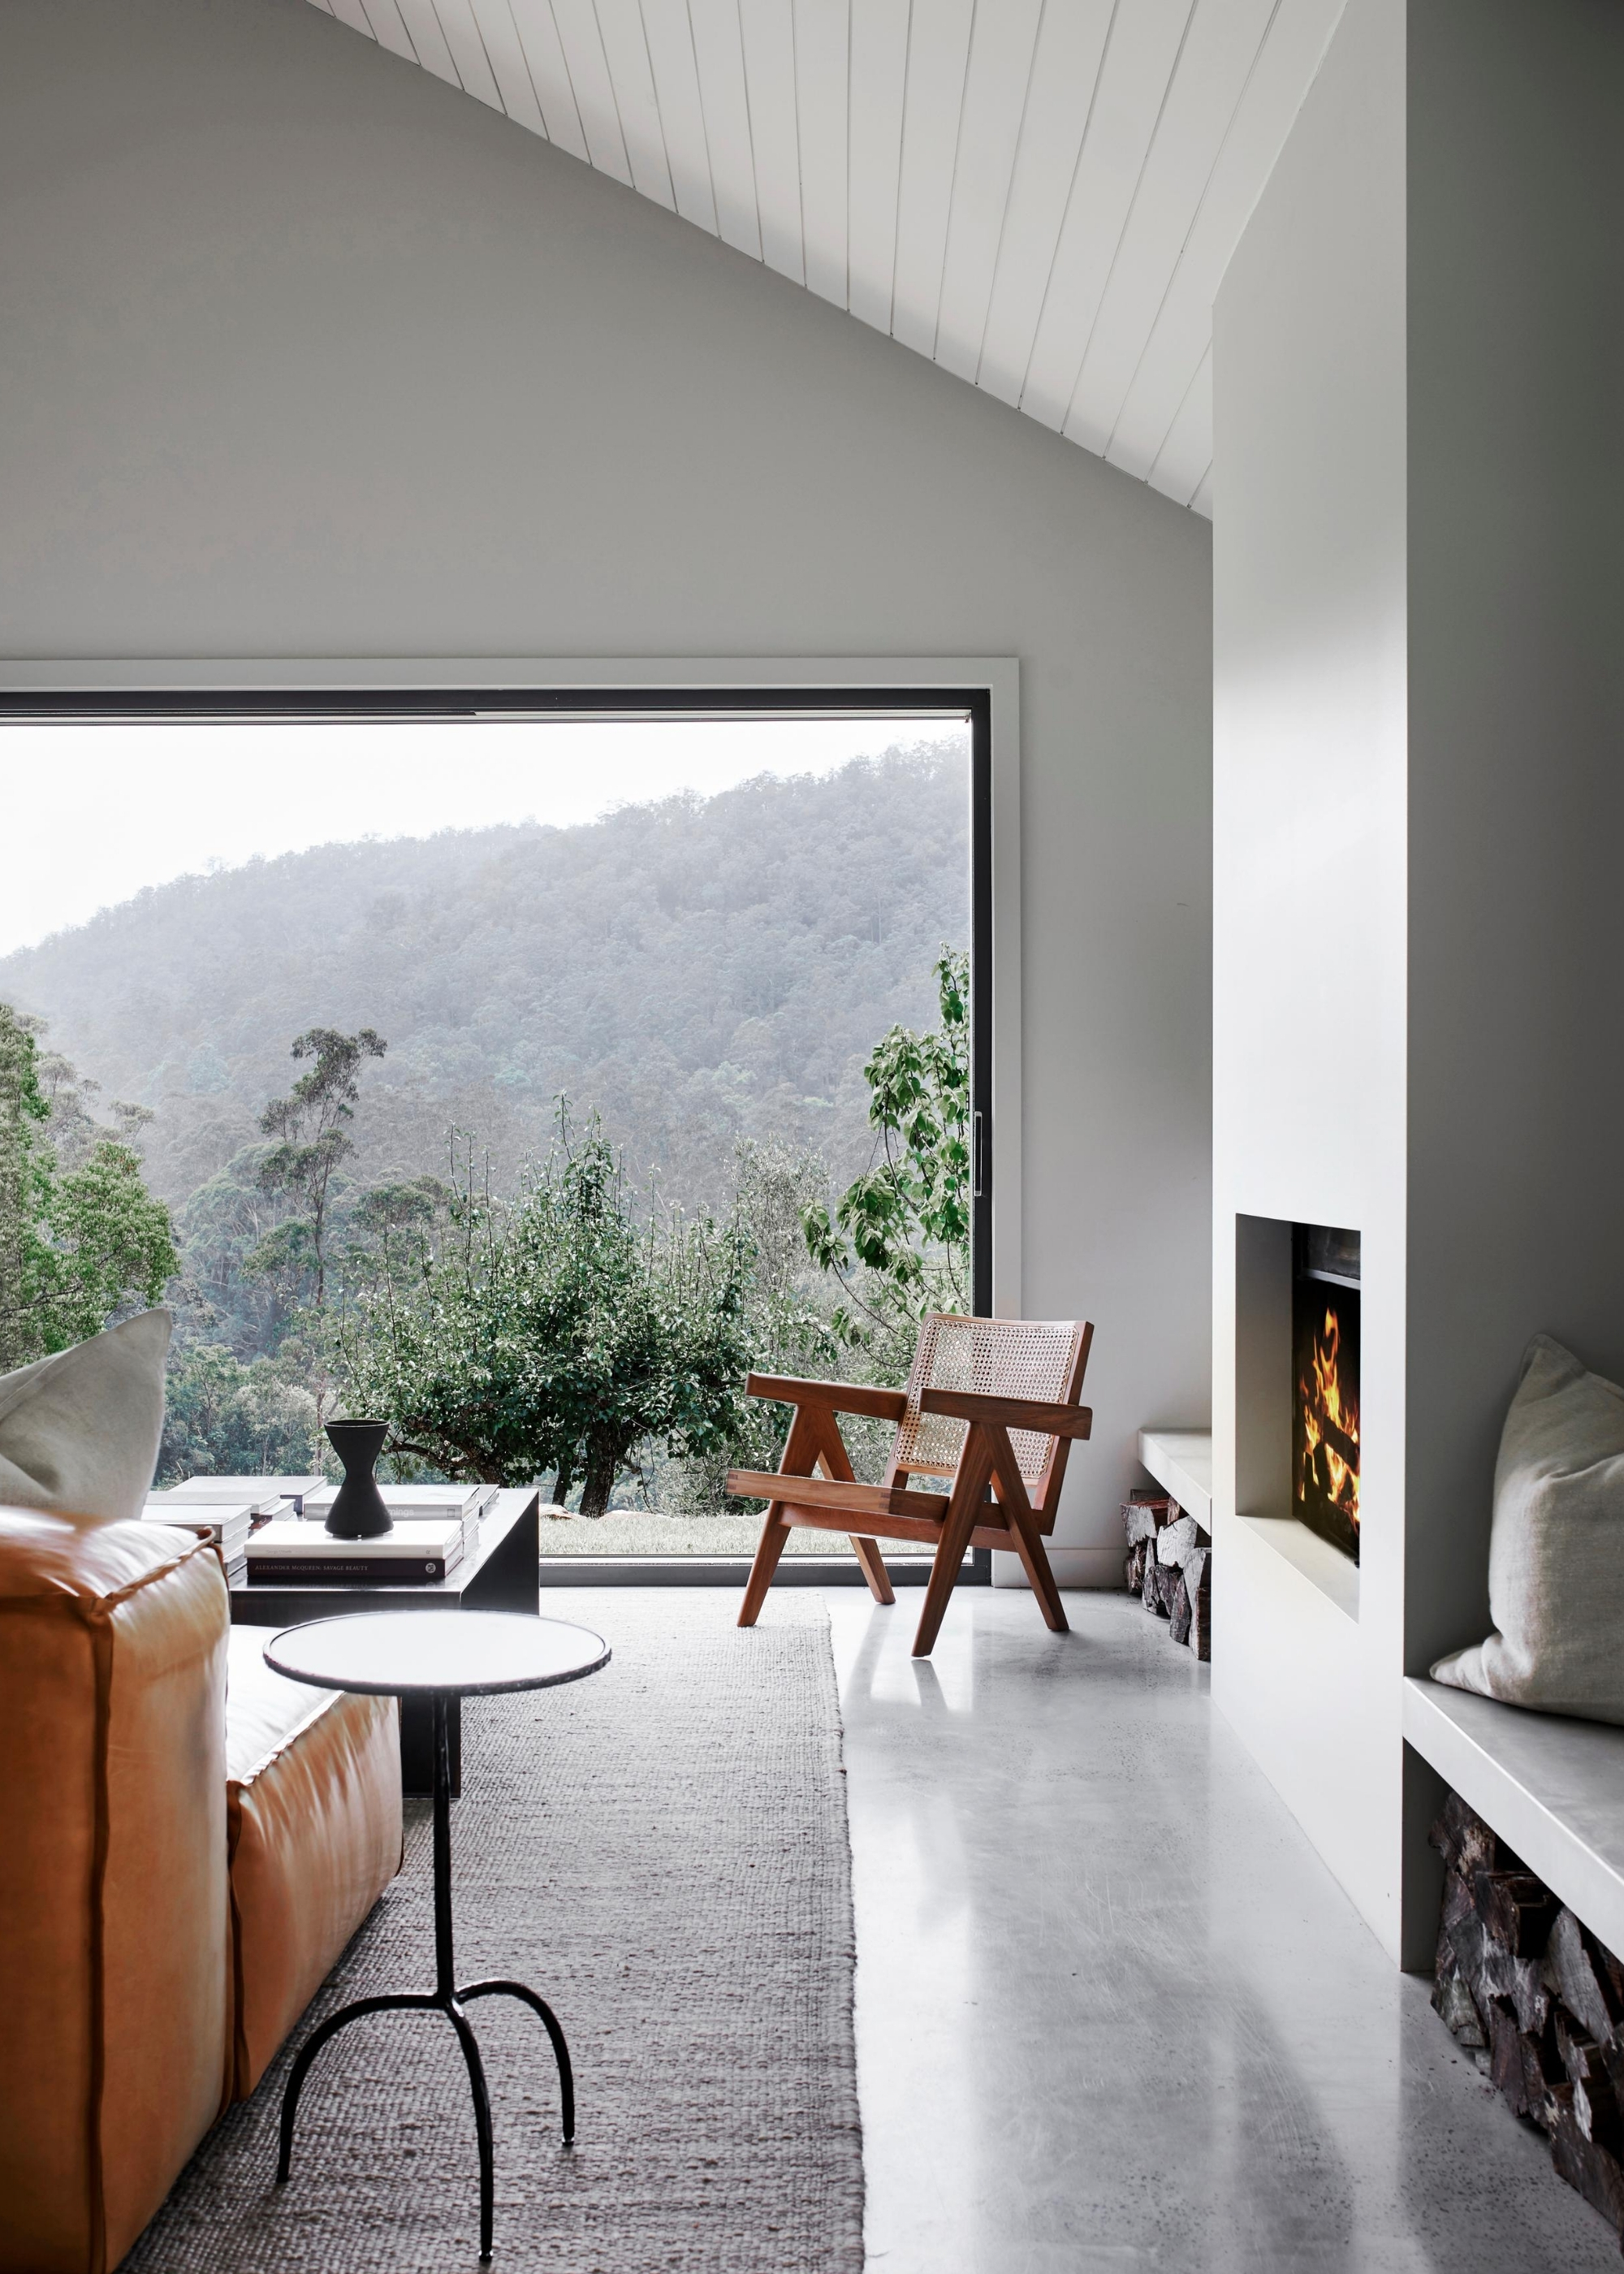 Estilo moderno para decorar tu casa